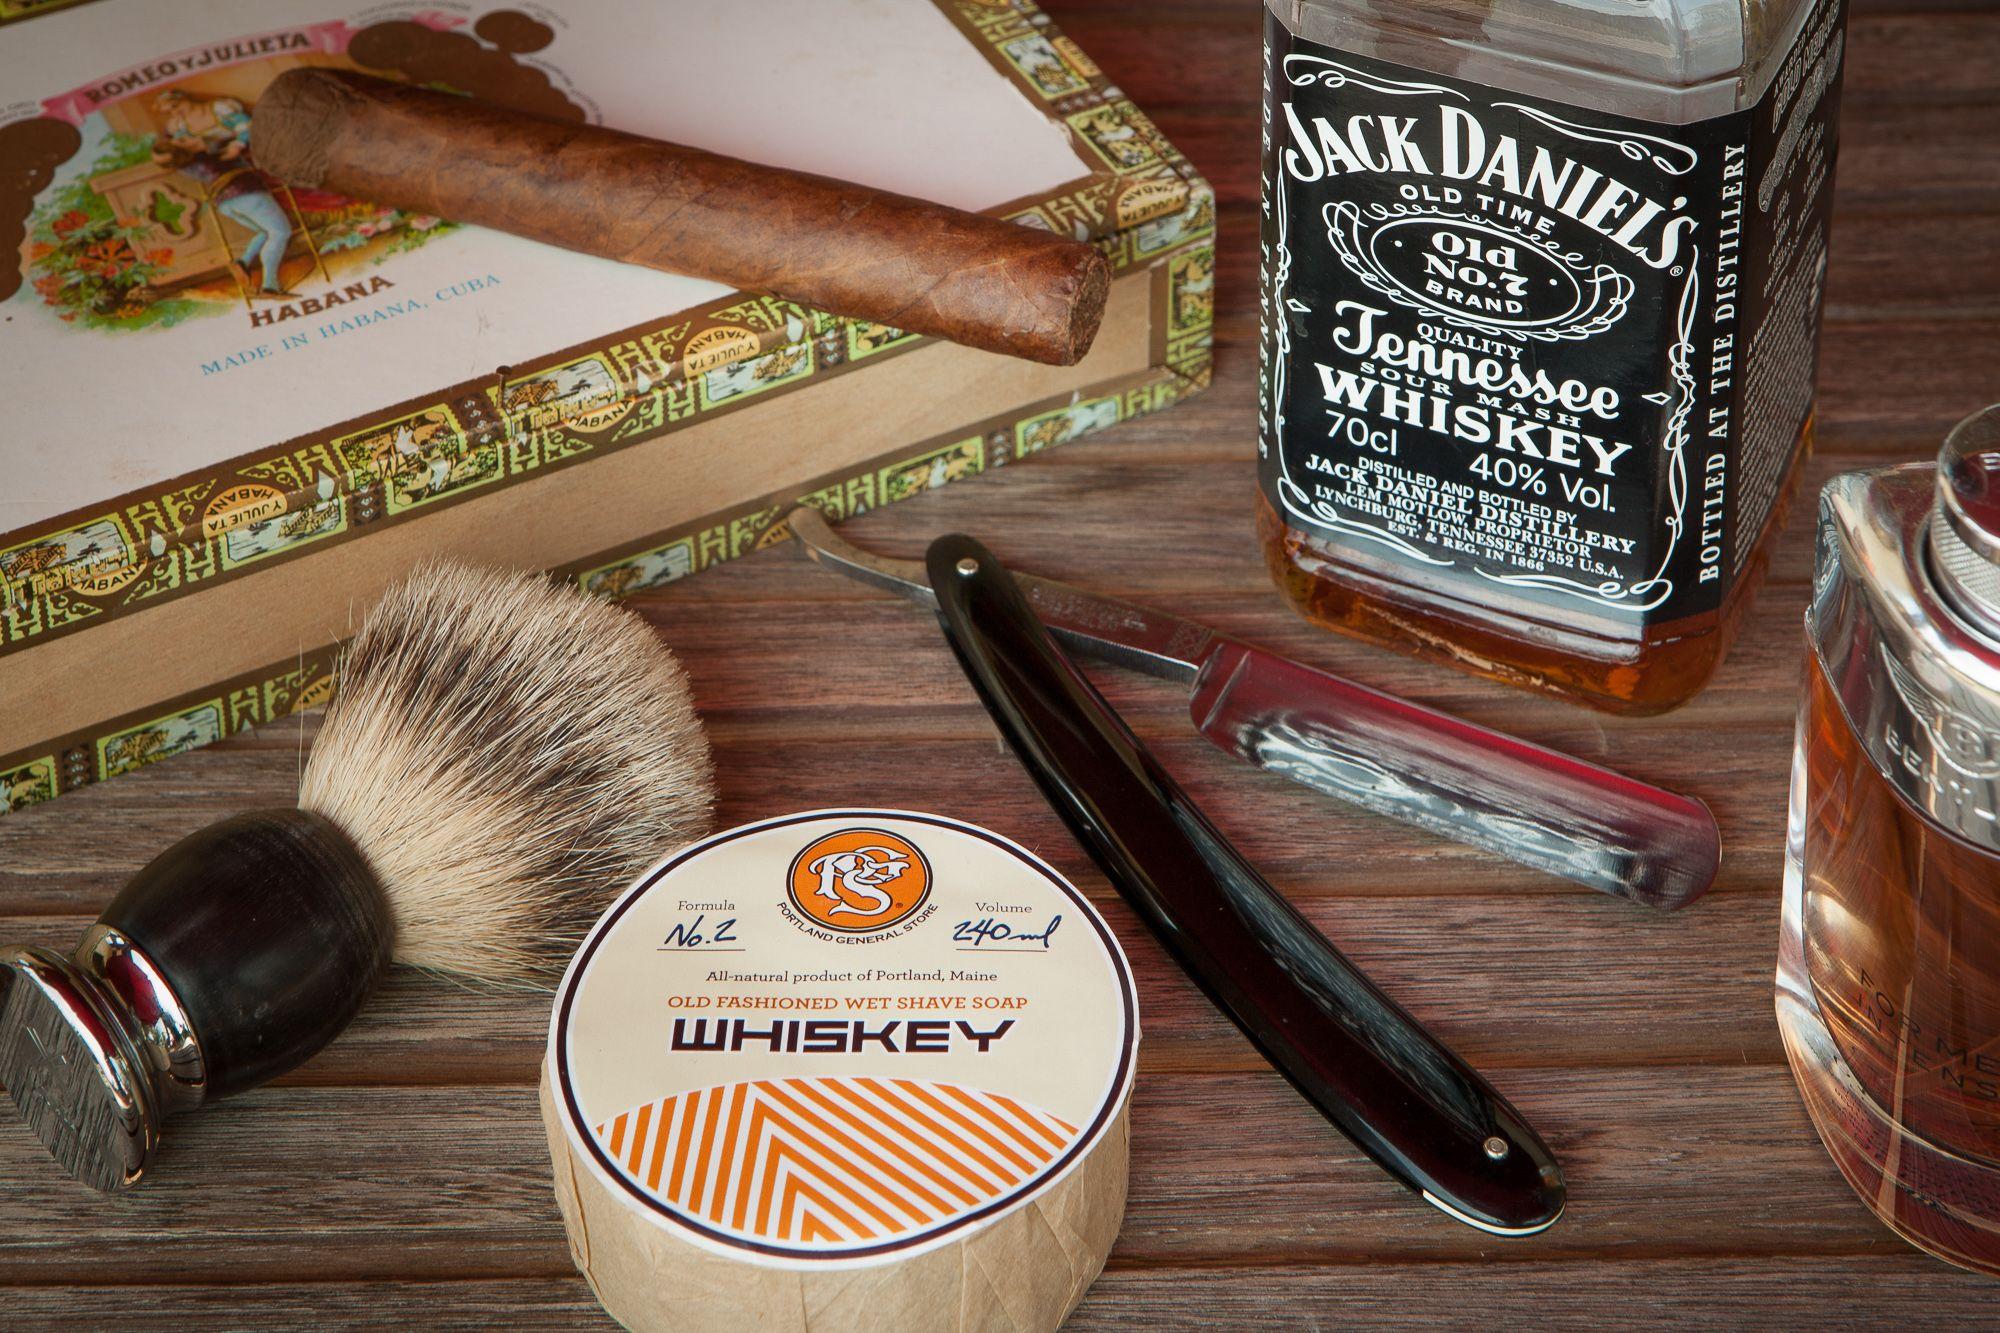 SOTD-2015.08.05-Portland-General-Store-Whiskey